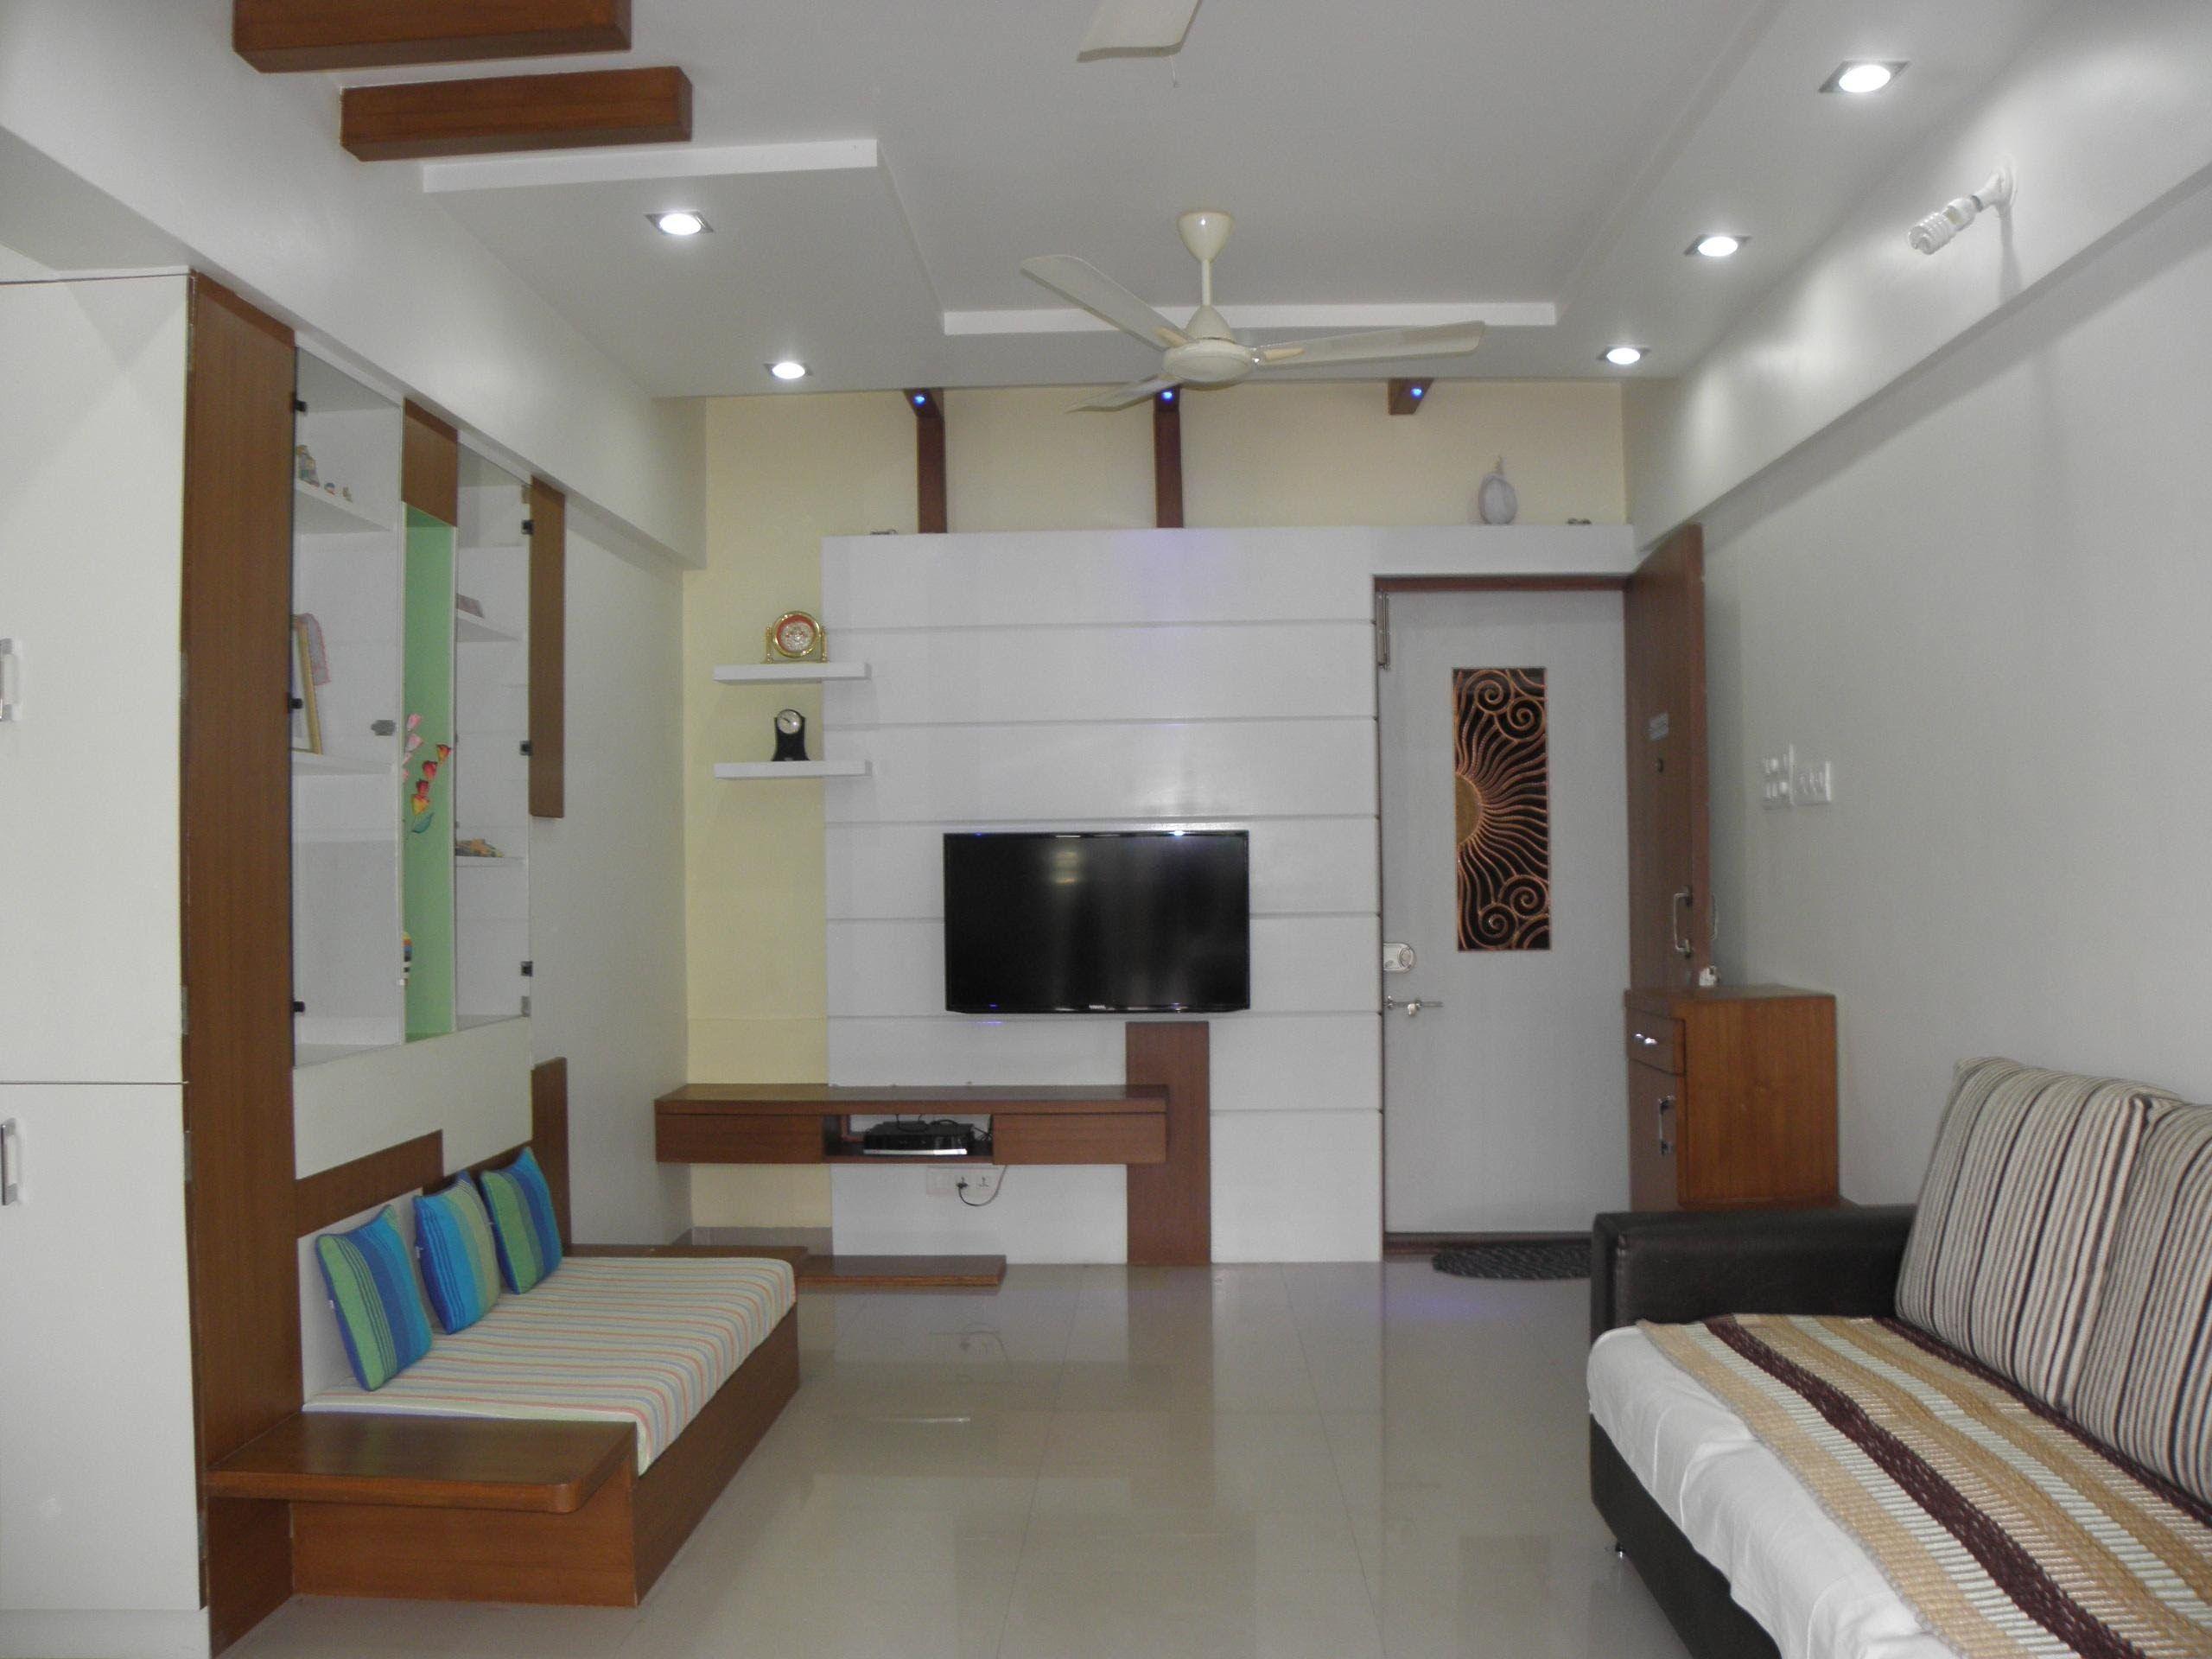 Interior Design Cost For Living Room Captivating $13 Million Boutique Condo In New York  Interior Designs Inspiration